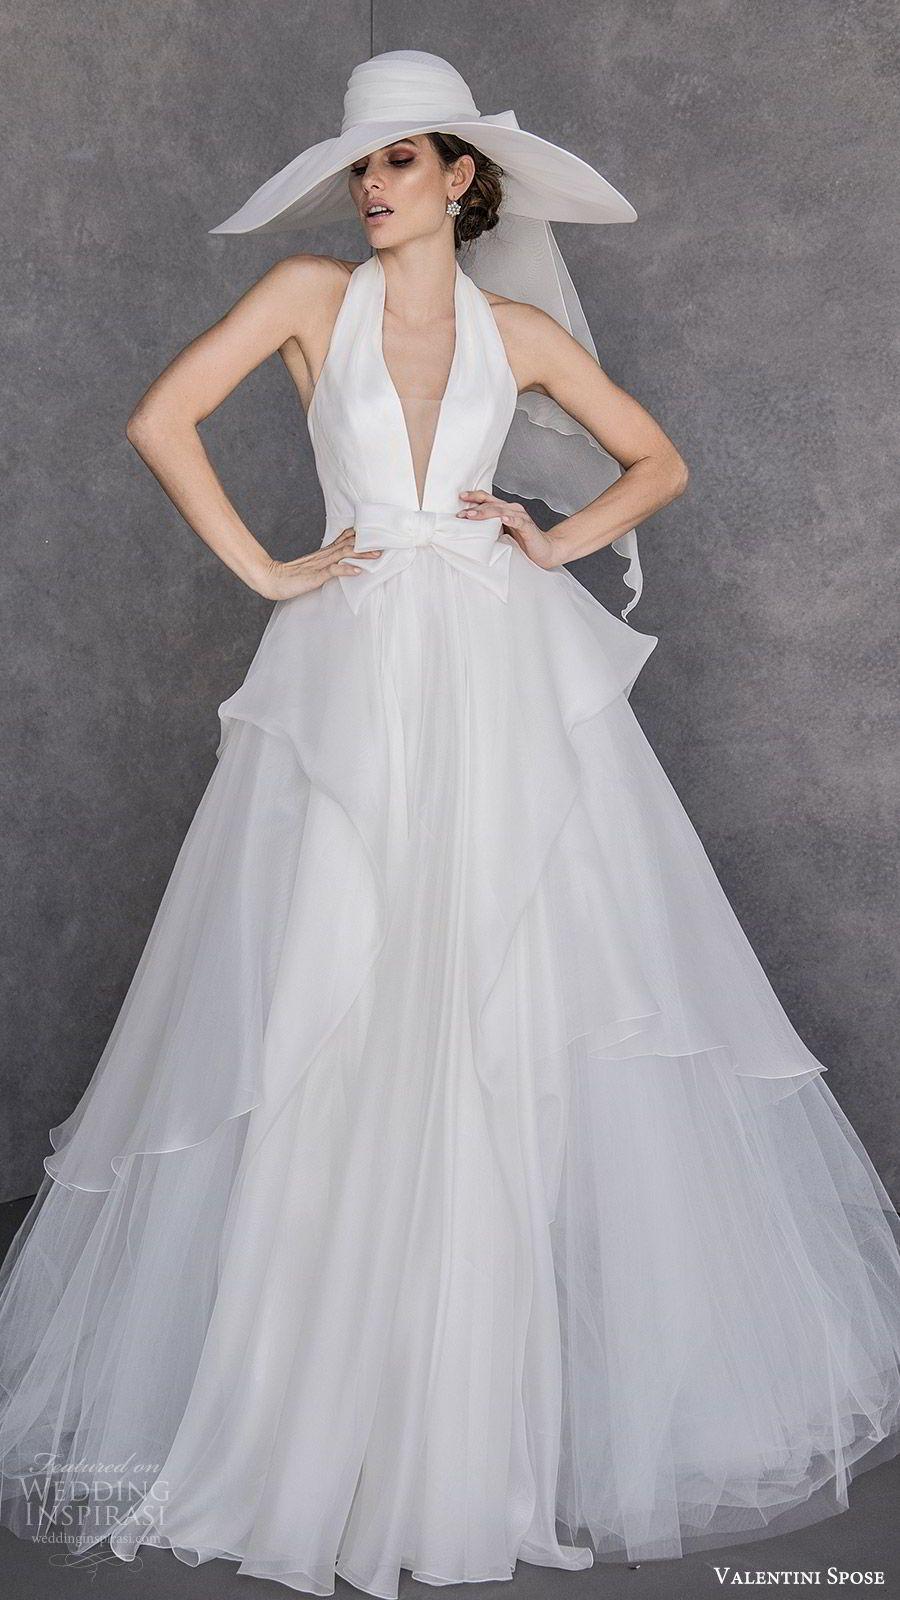 sports shoes fc791 4a198 Valentini Spose Spring 2020 Wedding Dresses | vestiti nel ...